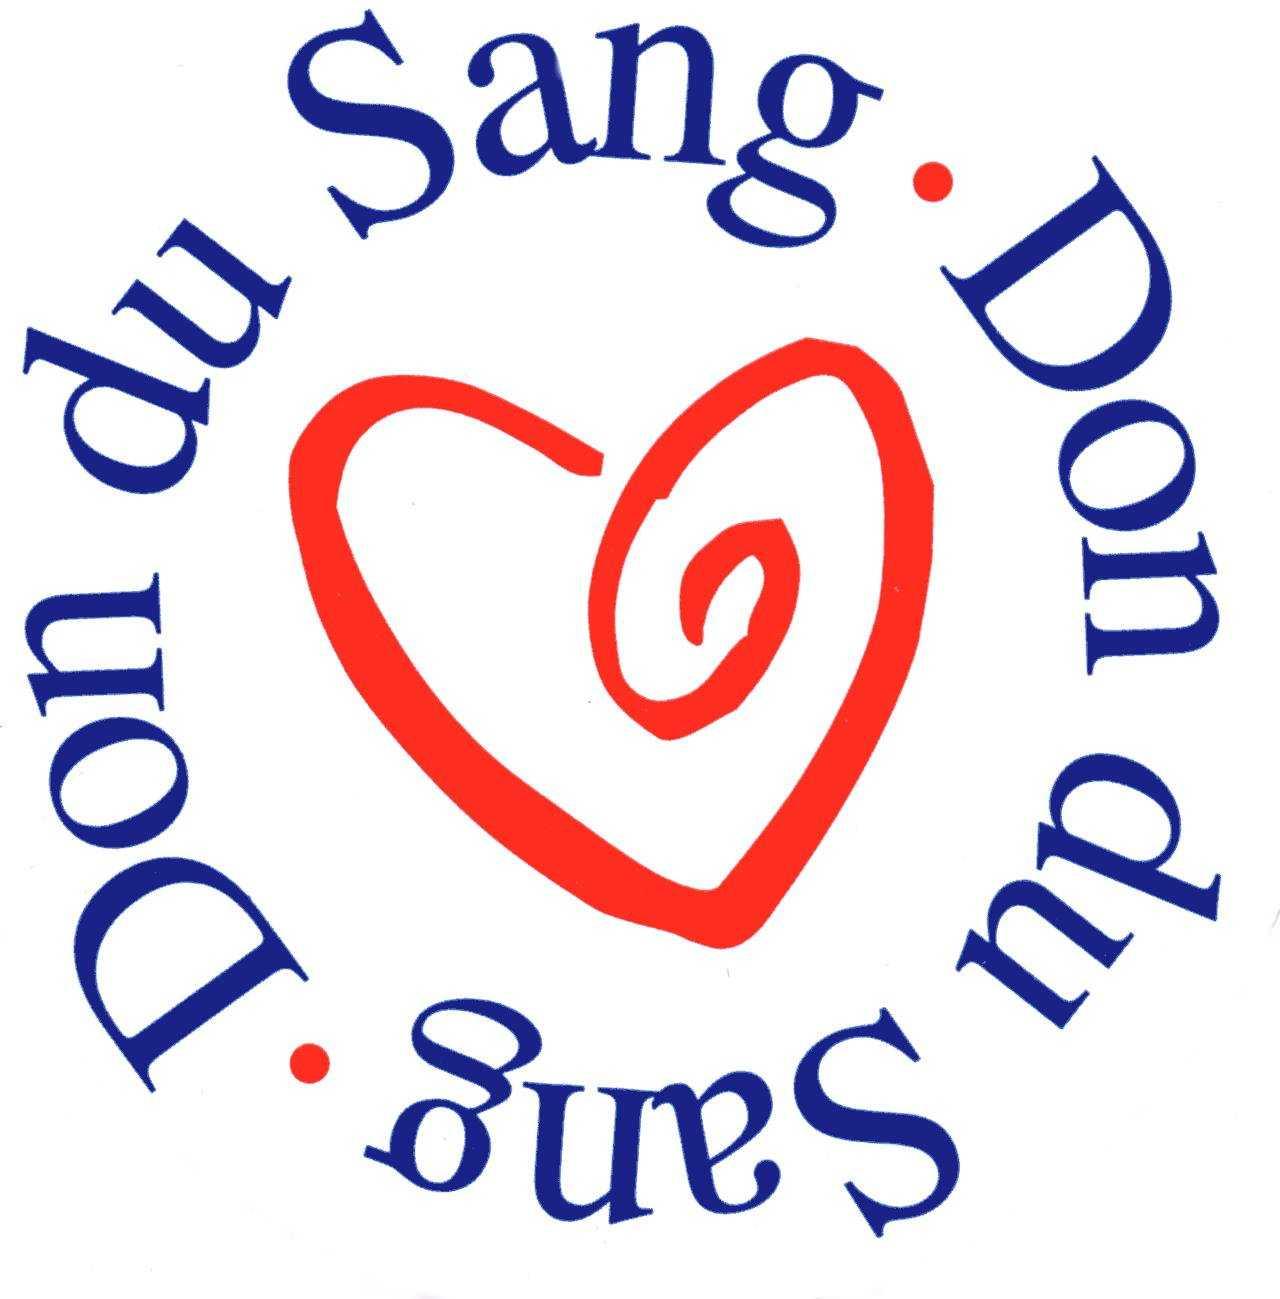 Sang Logo photo - 1